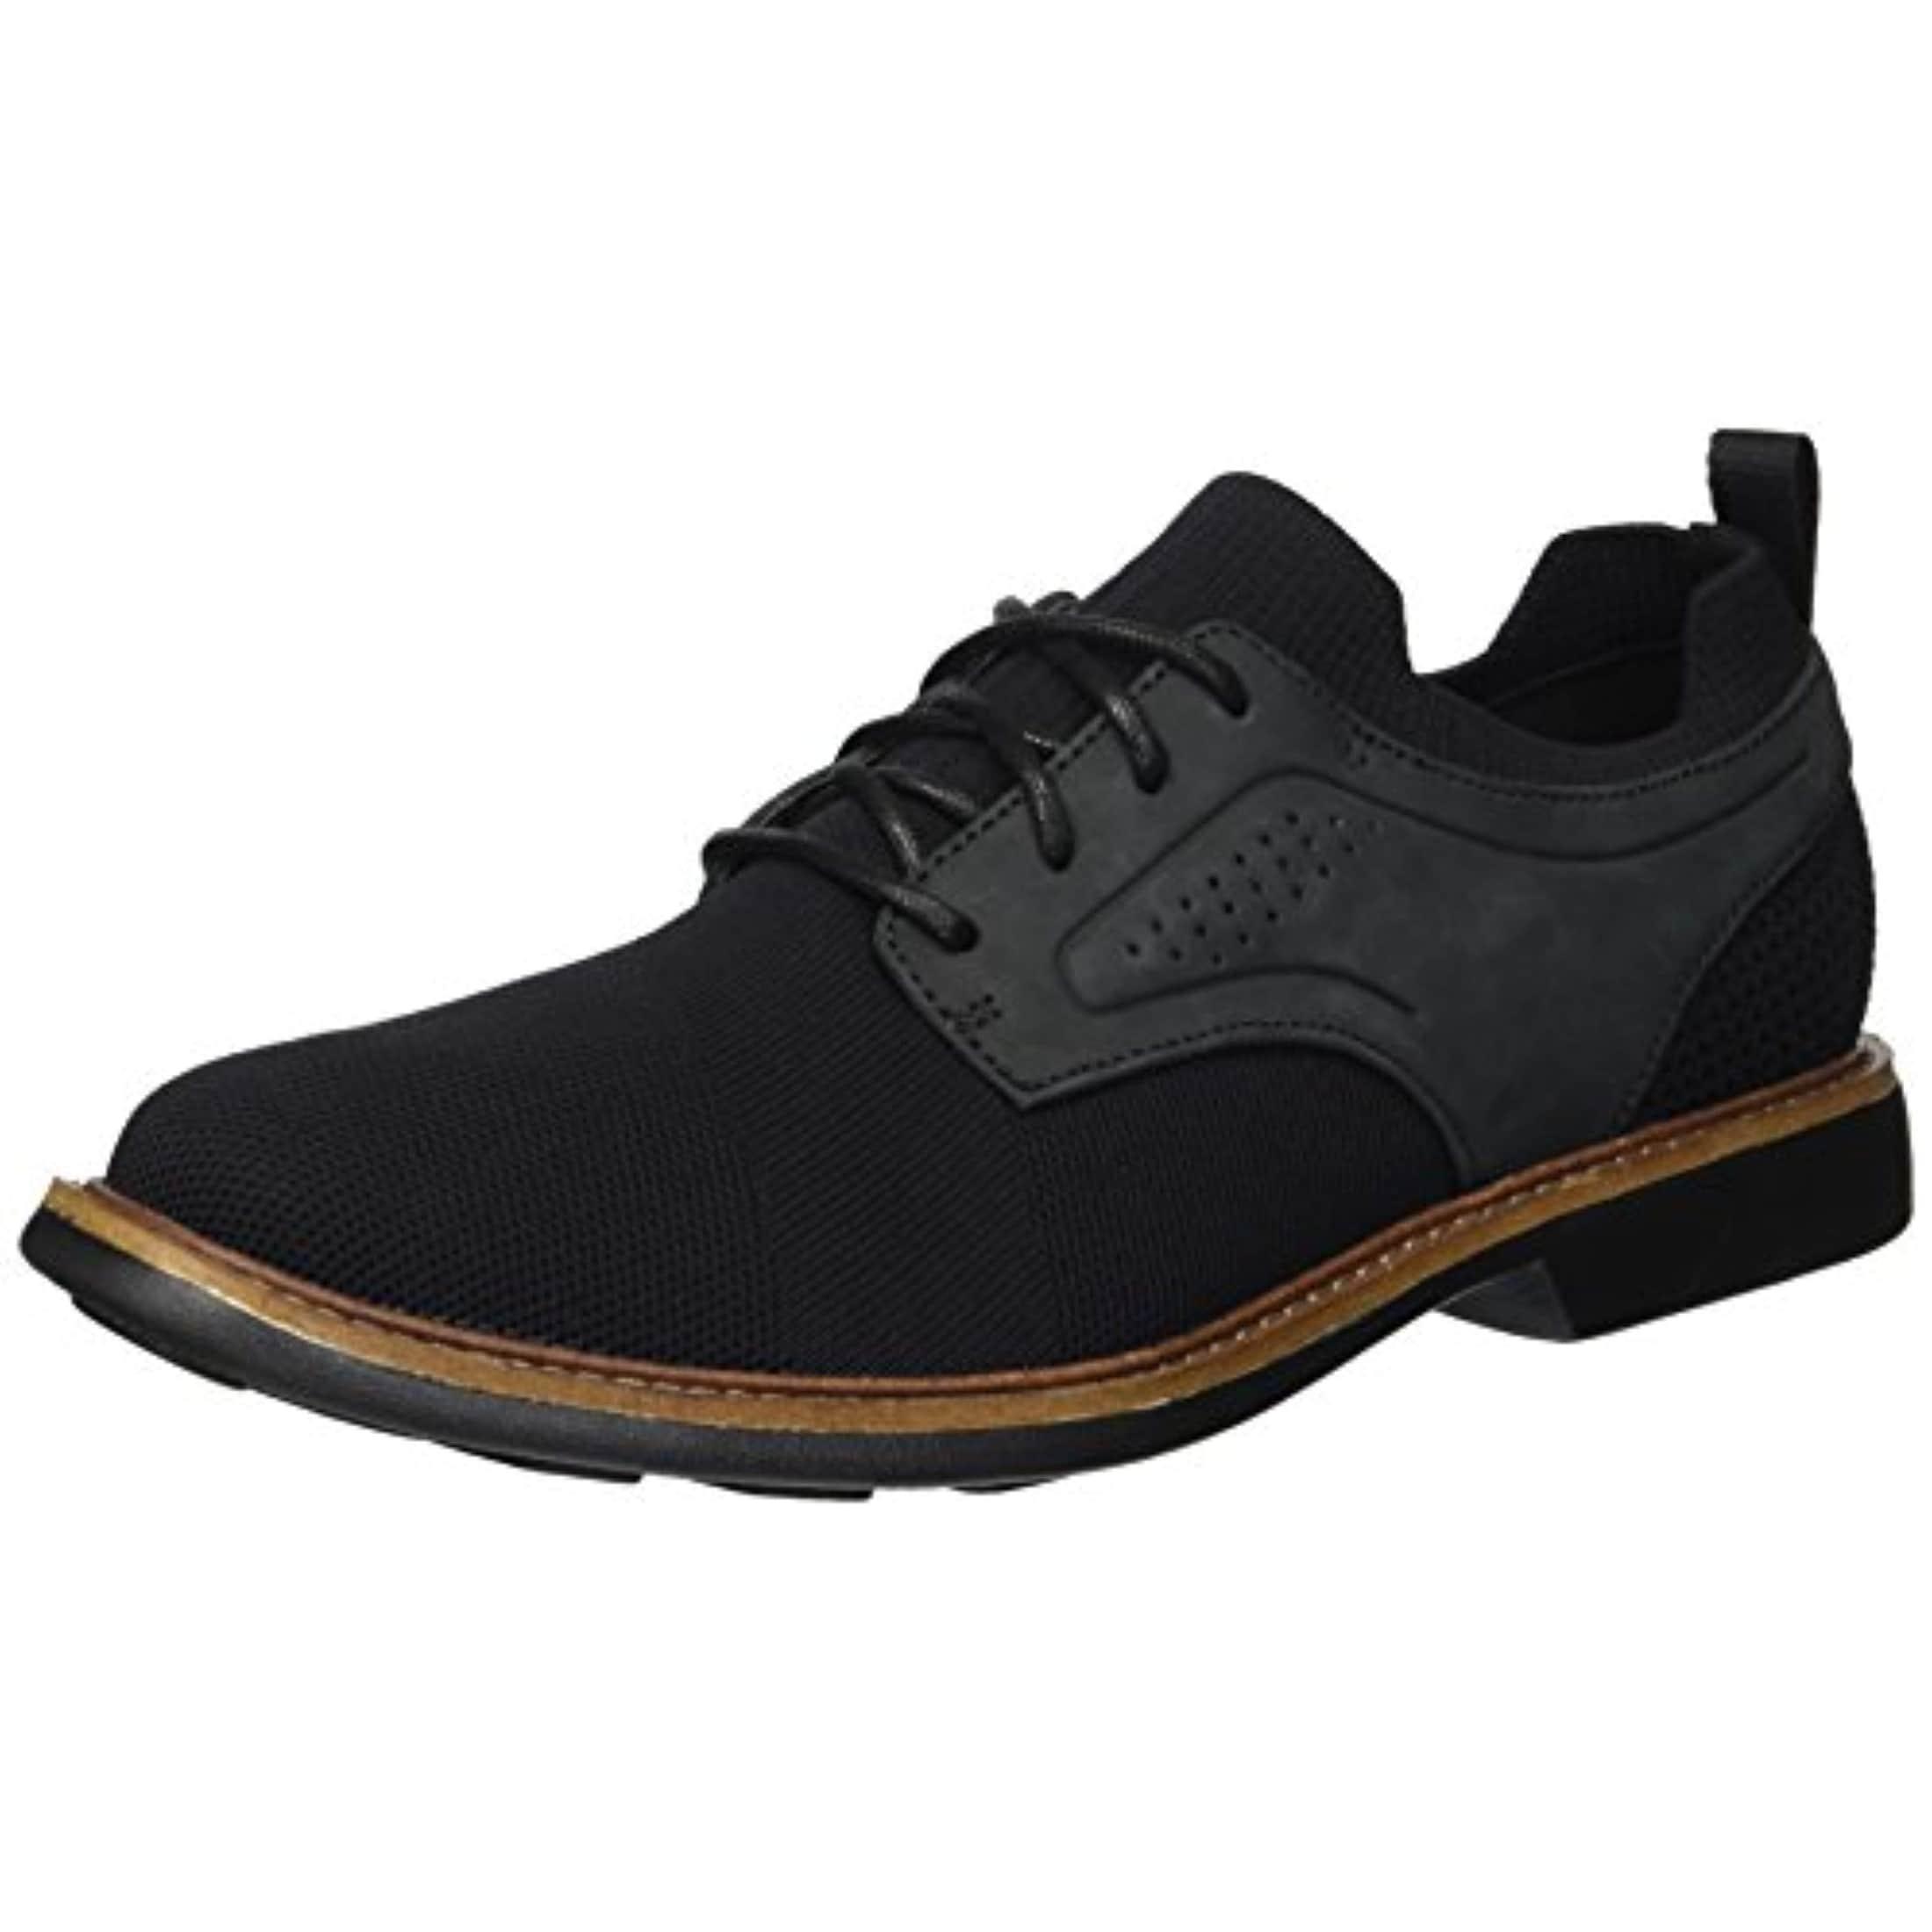 mark nason men\u0027s shoes find great shoes deals shopping at overstockReebok Running Pols Bidon #15